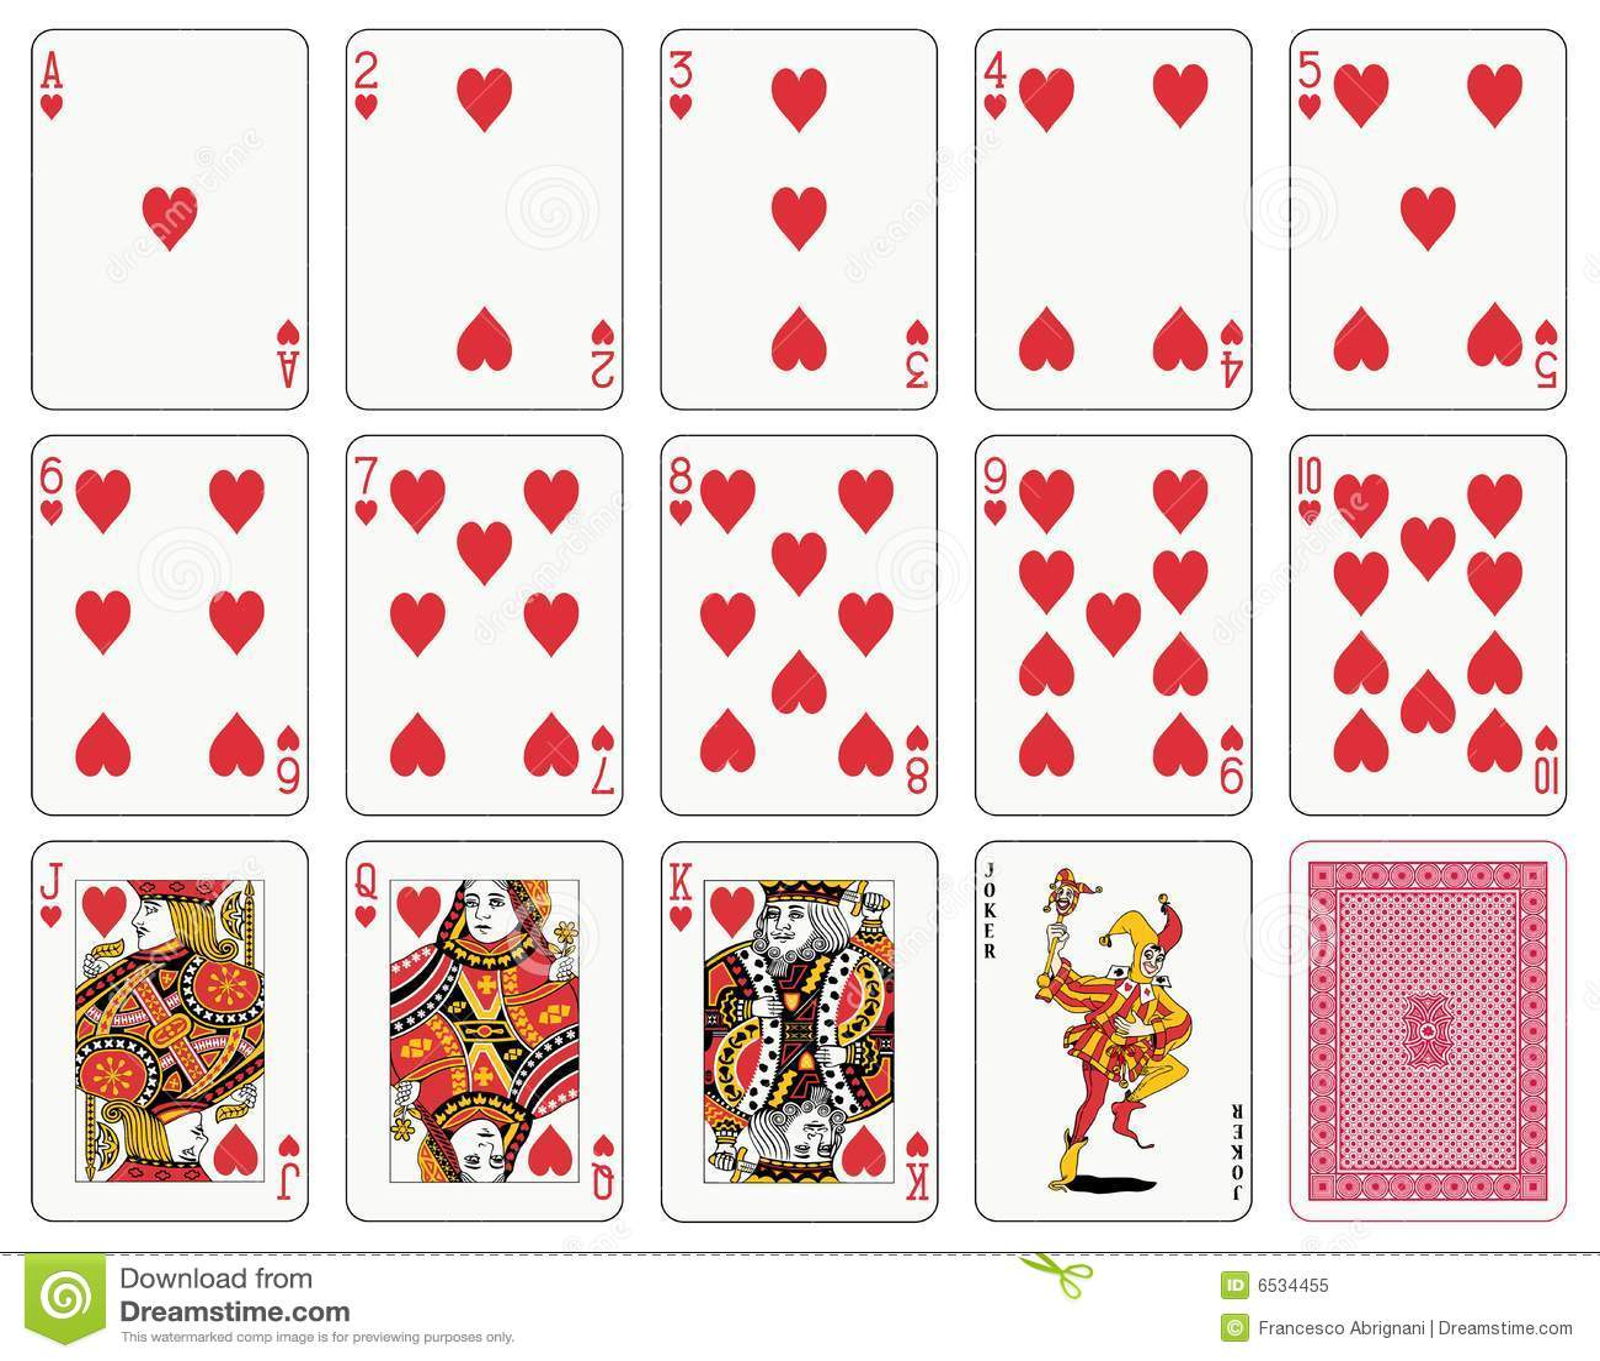 online casino no download online casino